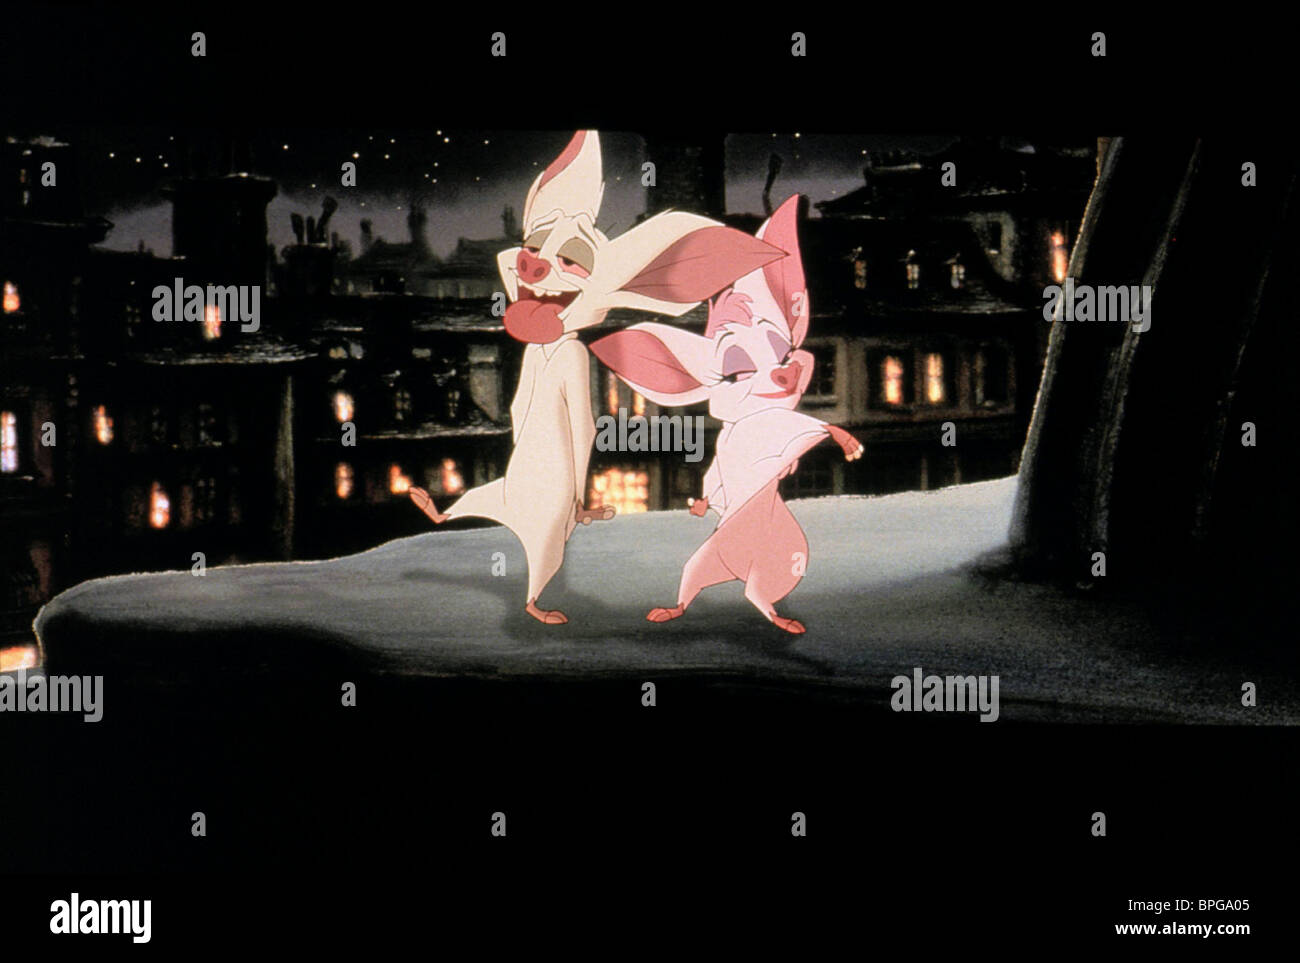 BARTOK ANASTASIA (1997) Imagen De Stock